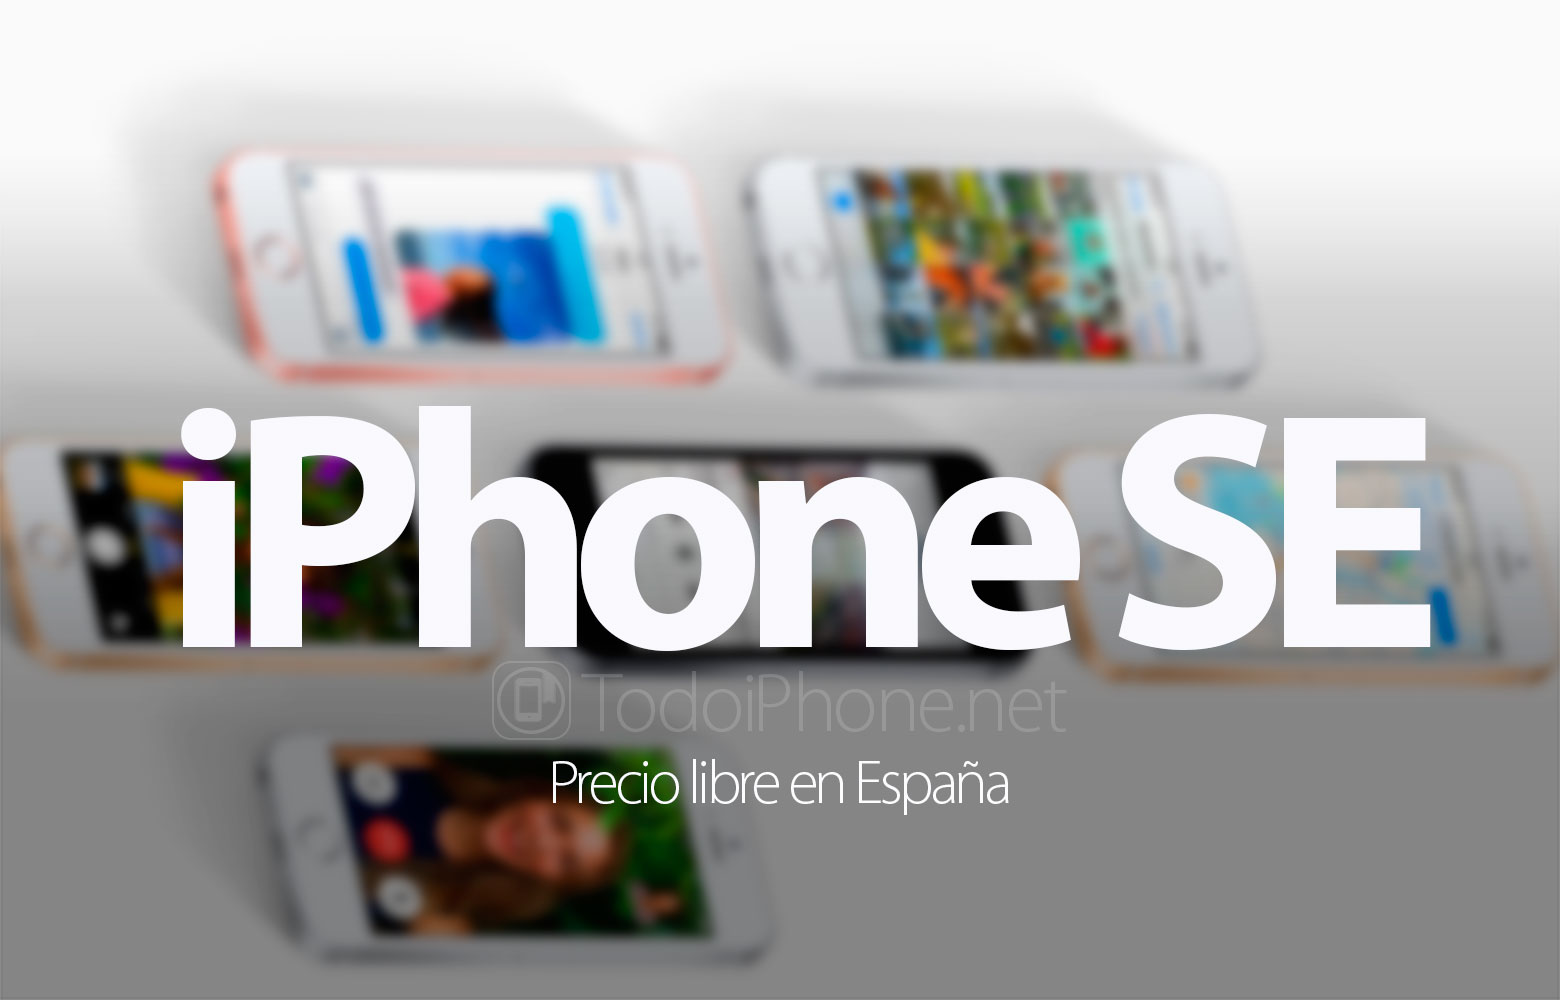 iphone-se-precio-libre-espana